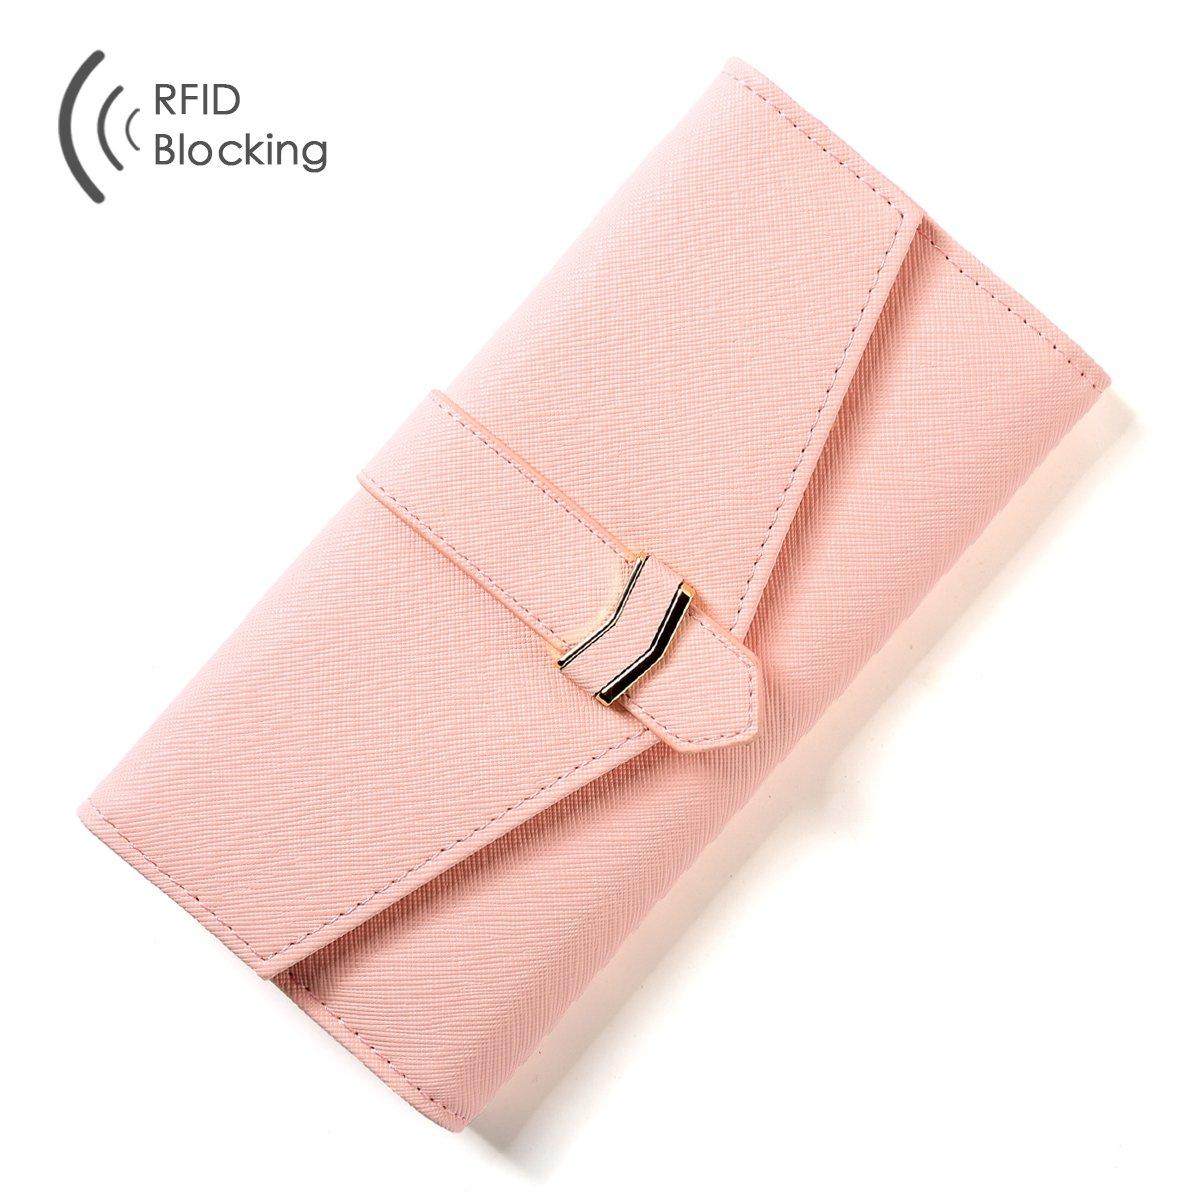 AOLINER ACCESSORY レディース B07918KRCW ピンク ピンク